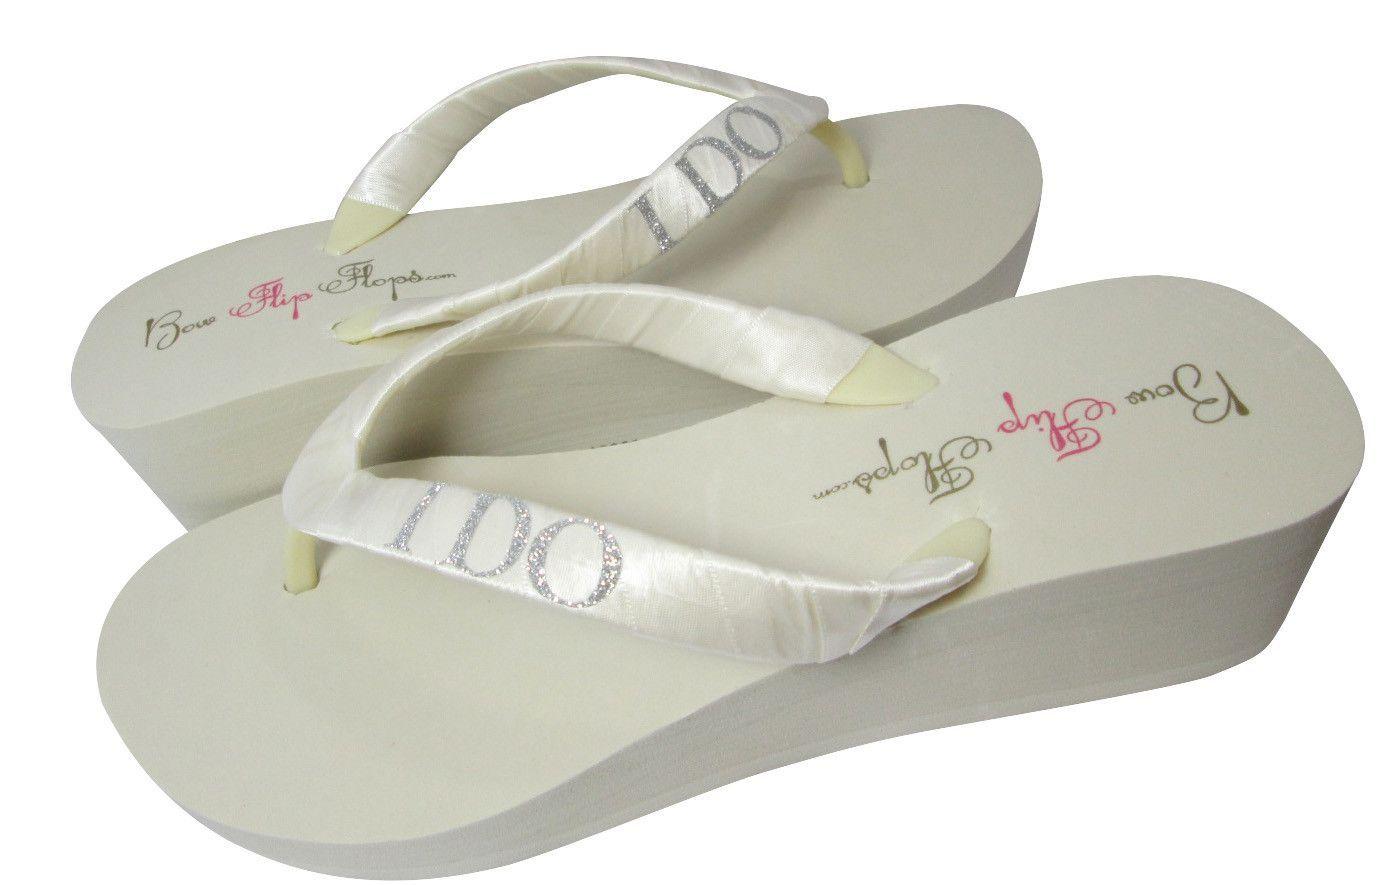 bdfb7d72edf38f Wedge Ivory I Do Flip Flops for the Bride- White -Silver Glitter- 2 inch  Heel